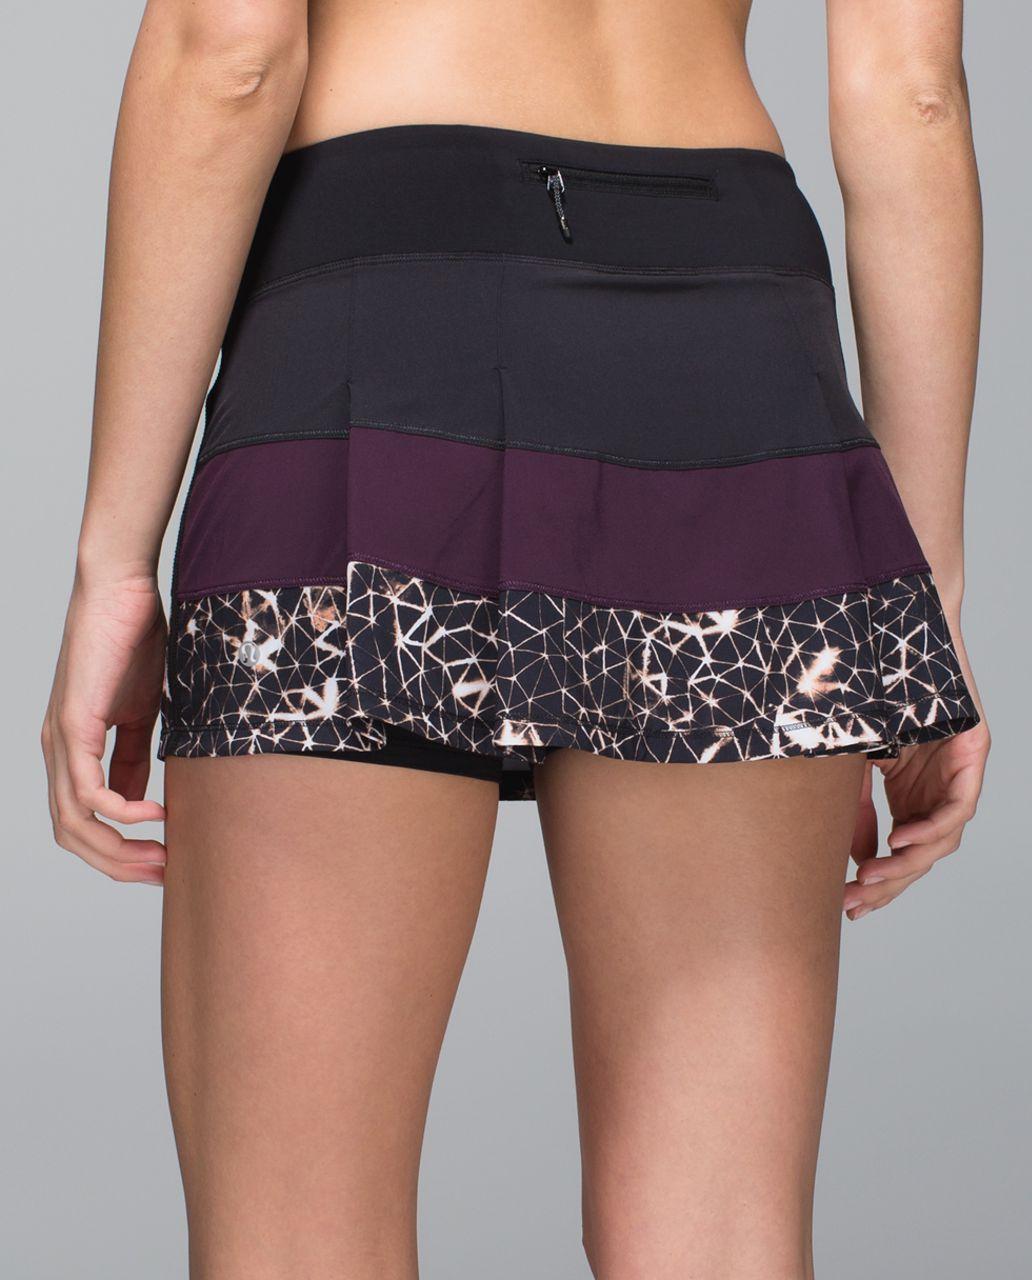 Lululemon Pace Rival Skirt II *4-way Stretch (Regular) - Black / Black Cherry / Star Crushed Black Cherry Black